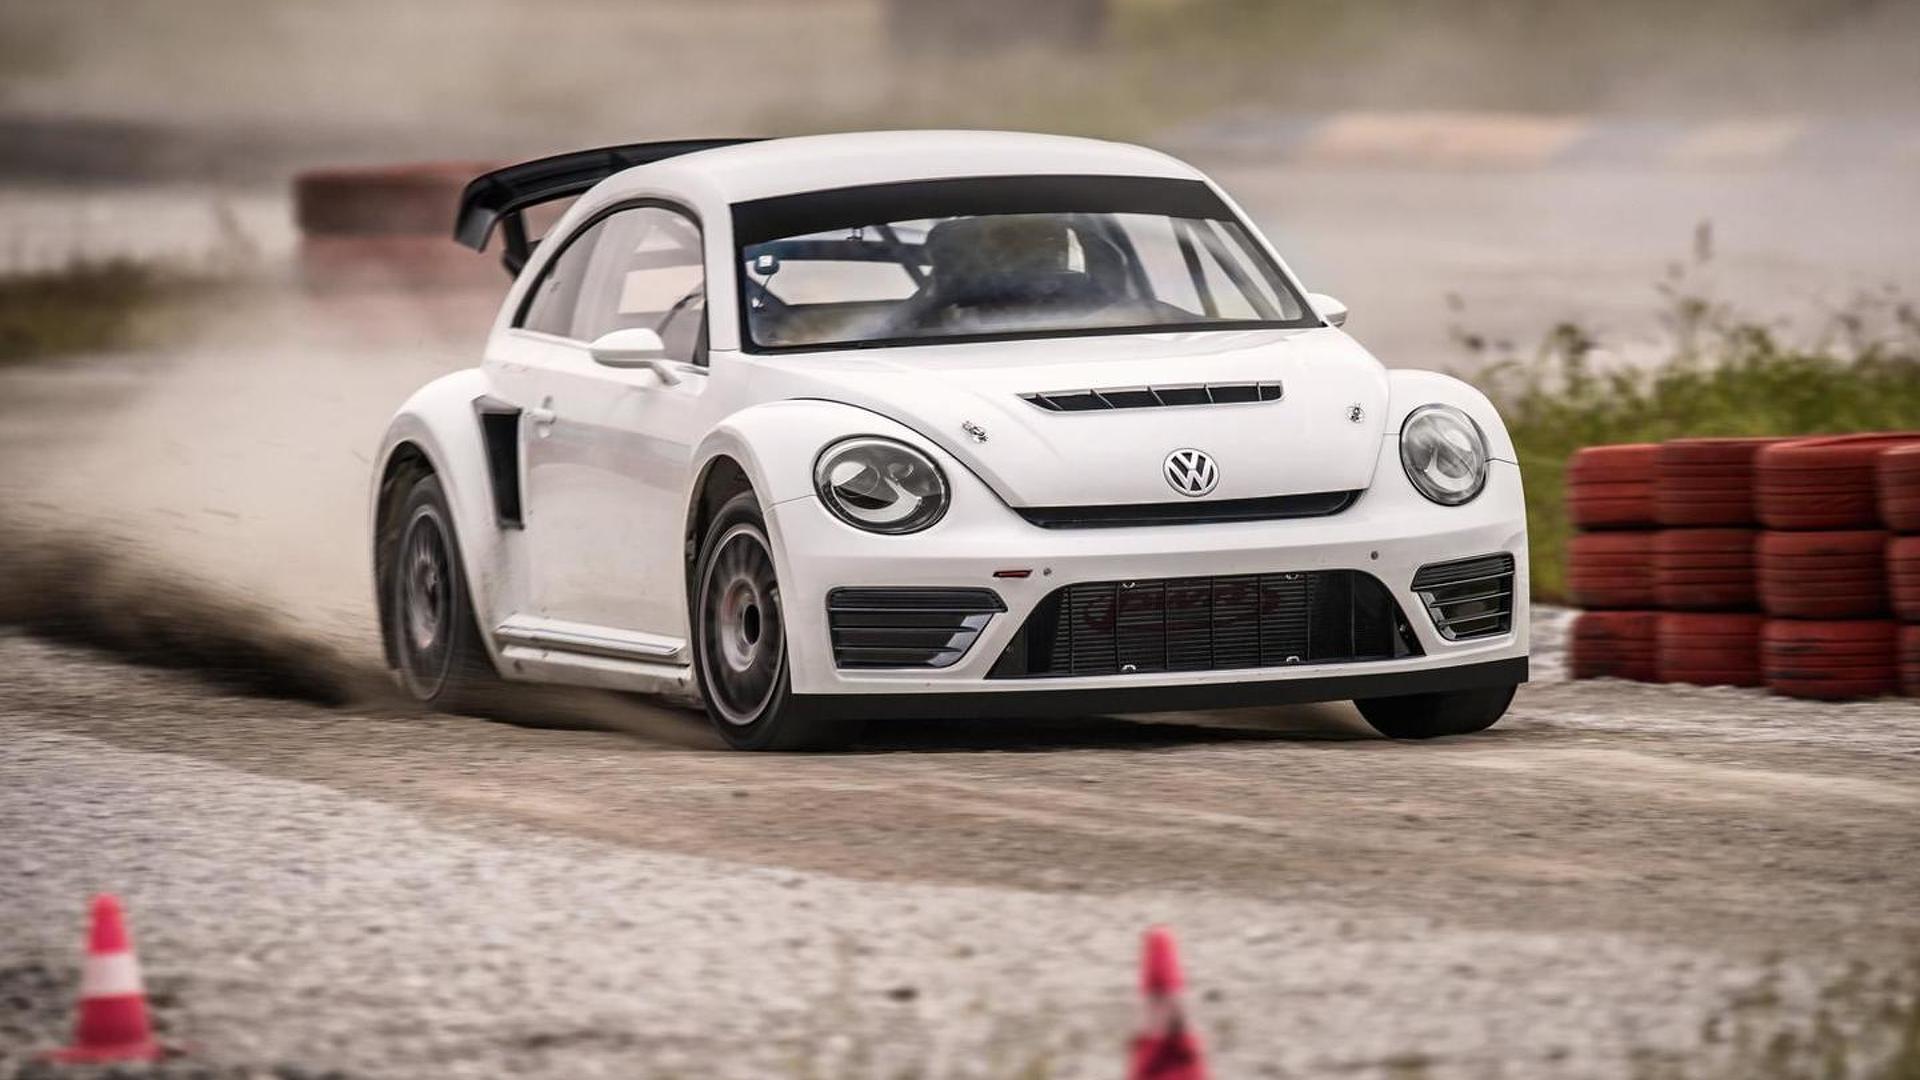 Ралли-кросс Volkswagen Beetle GRC 2014 года